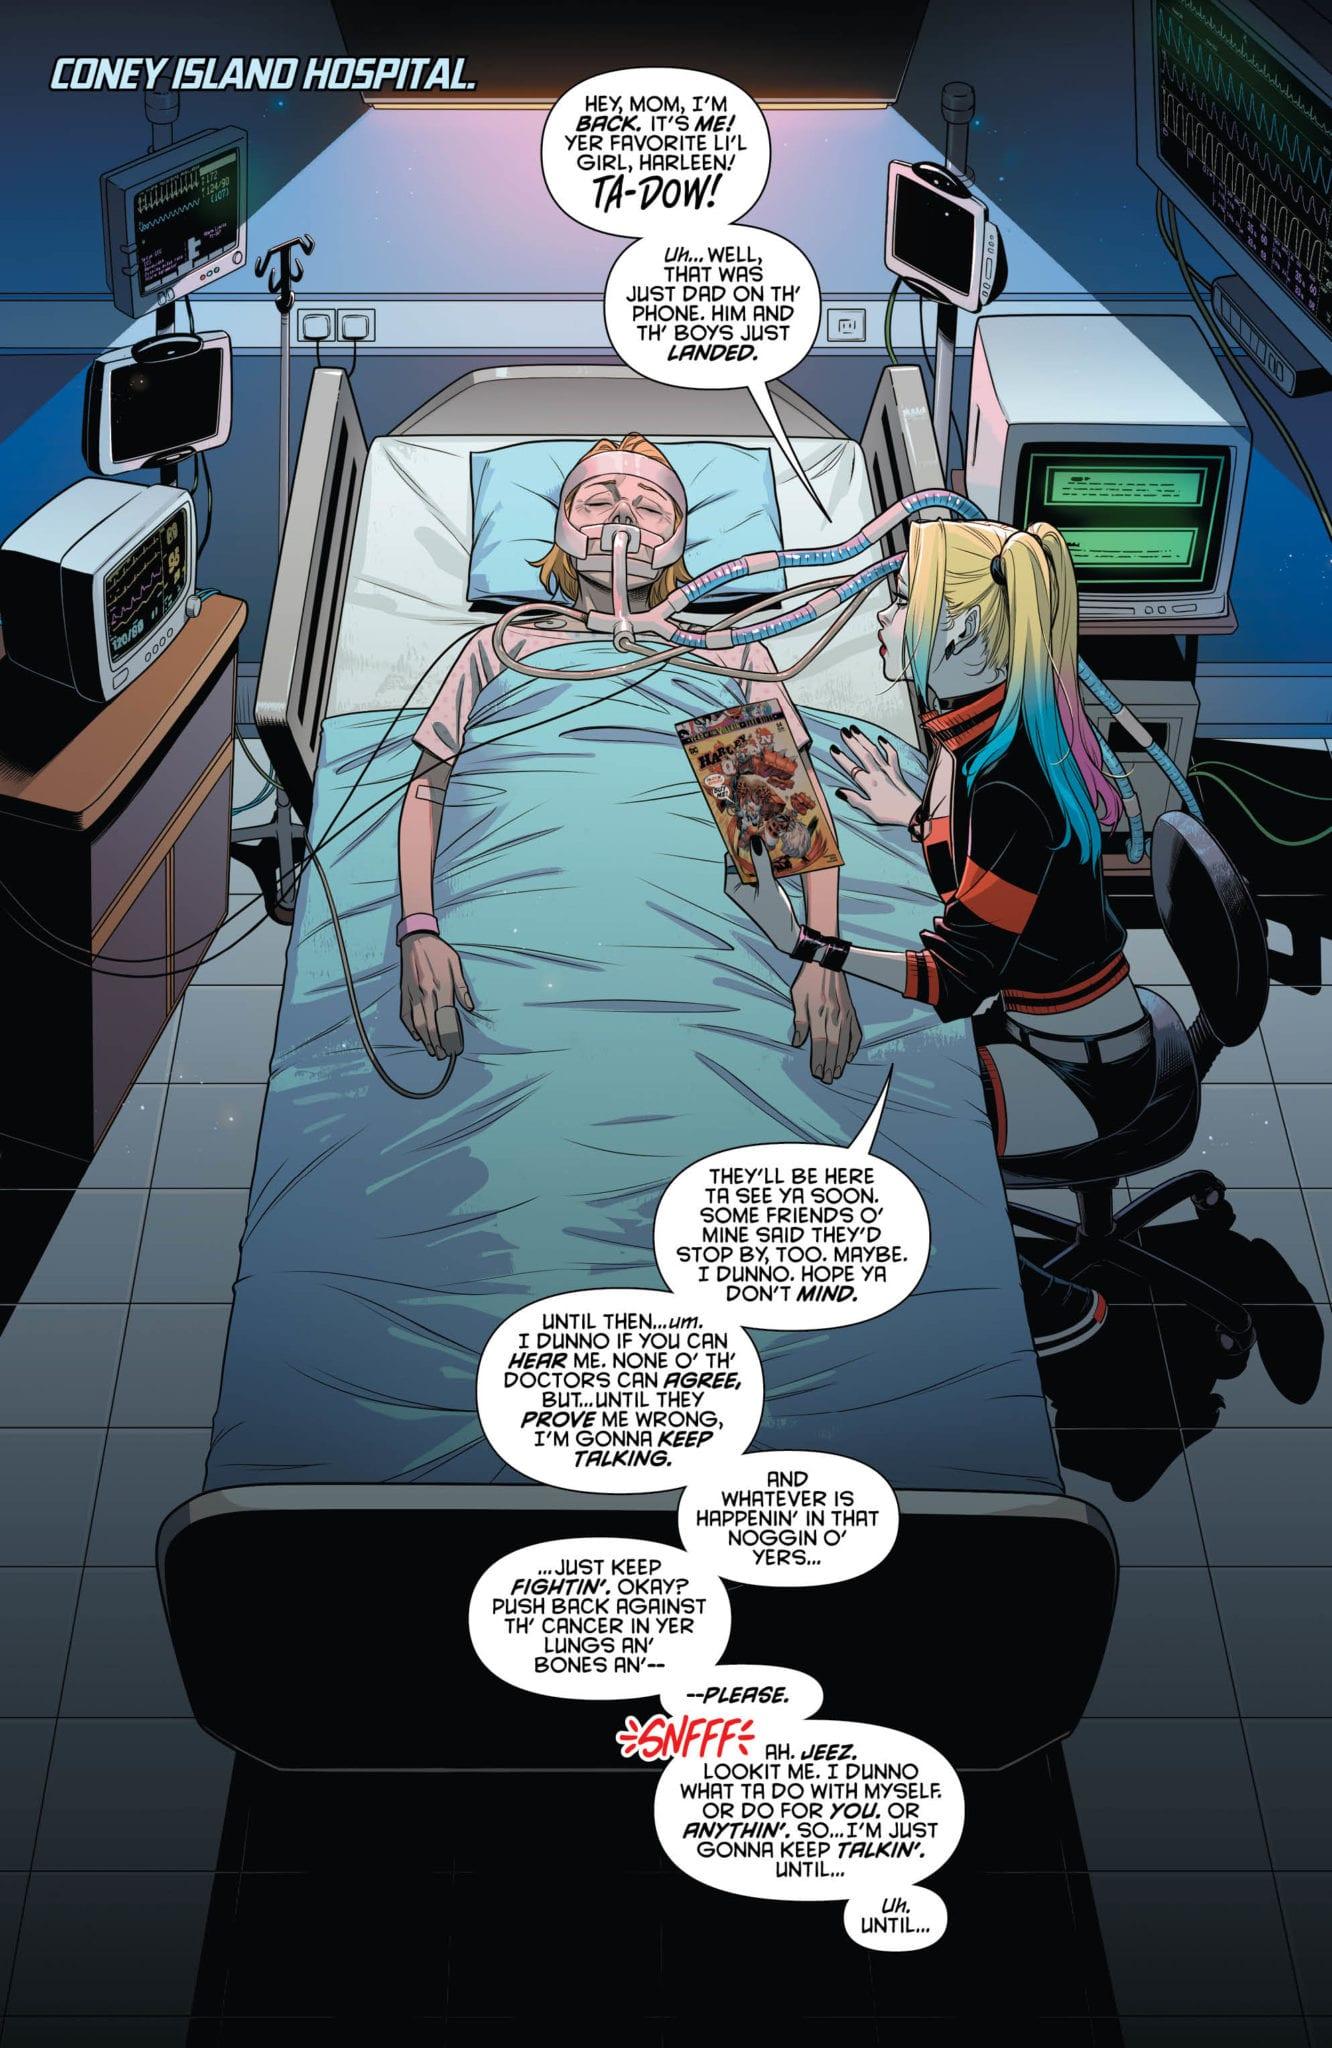 DC Comics Exclusive Preview: HARLEY QUINN #64 - Enter Apex Lex! 1